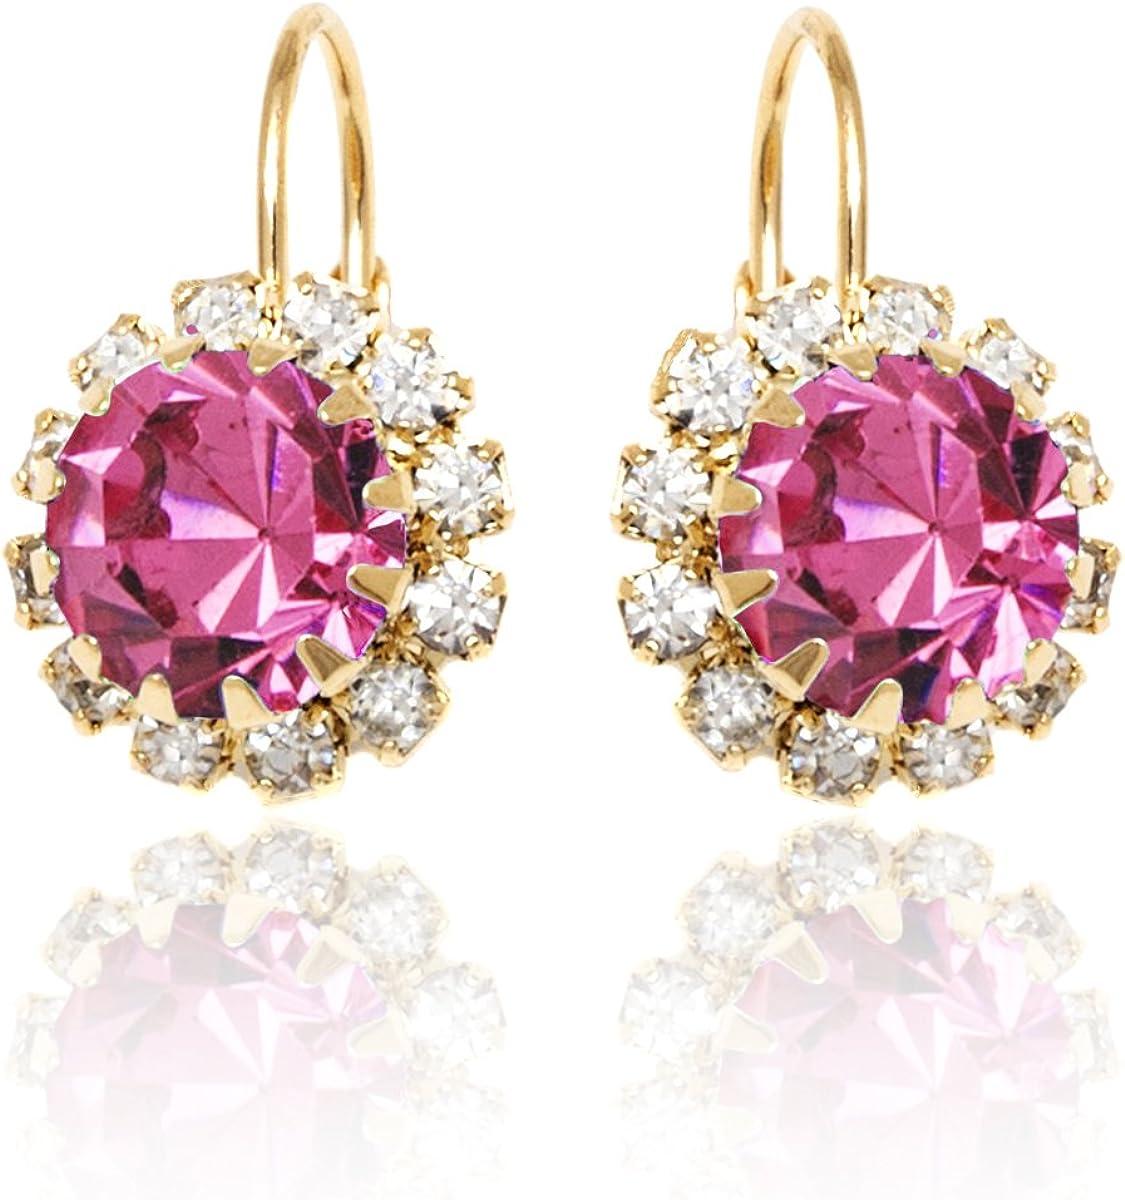 Crystal Flower Earrings For Women | Brazel 18K Gold Plated Crystal Flower Earrings Cubic Zirconia Earrings for Women